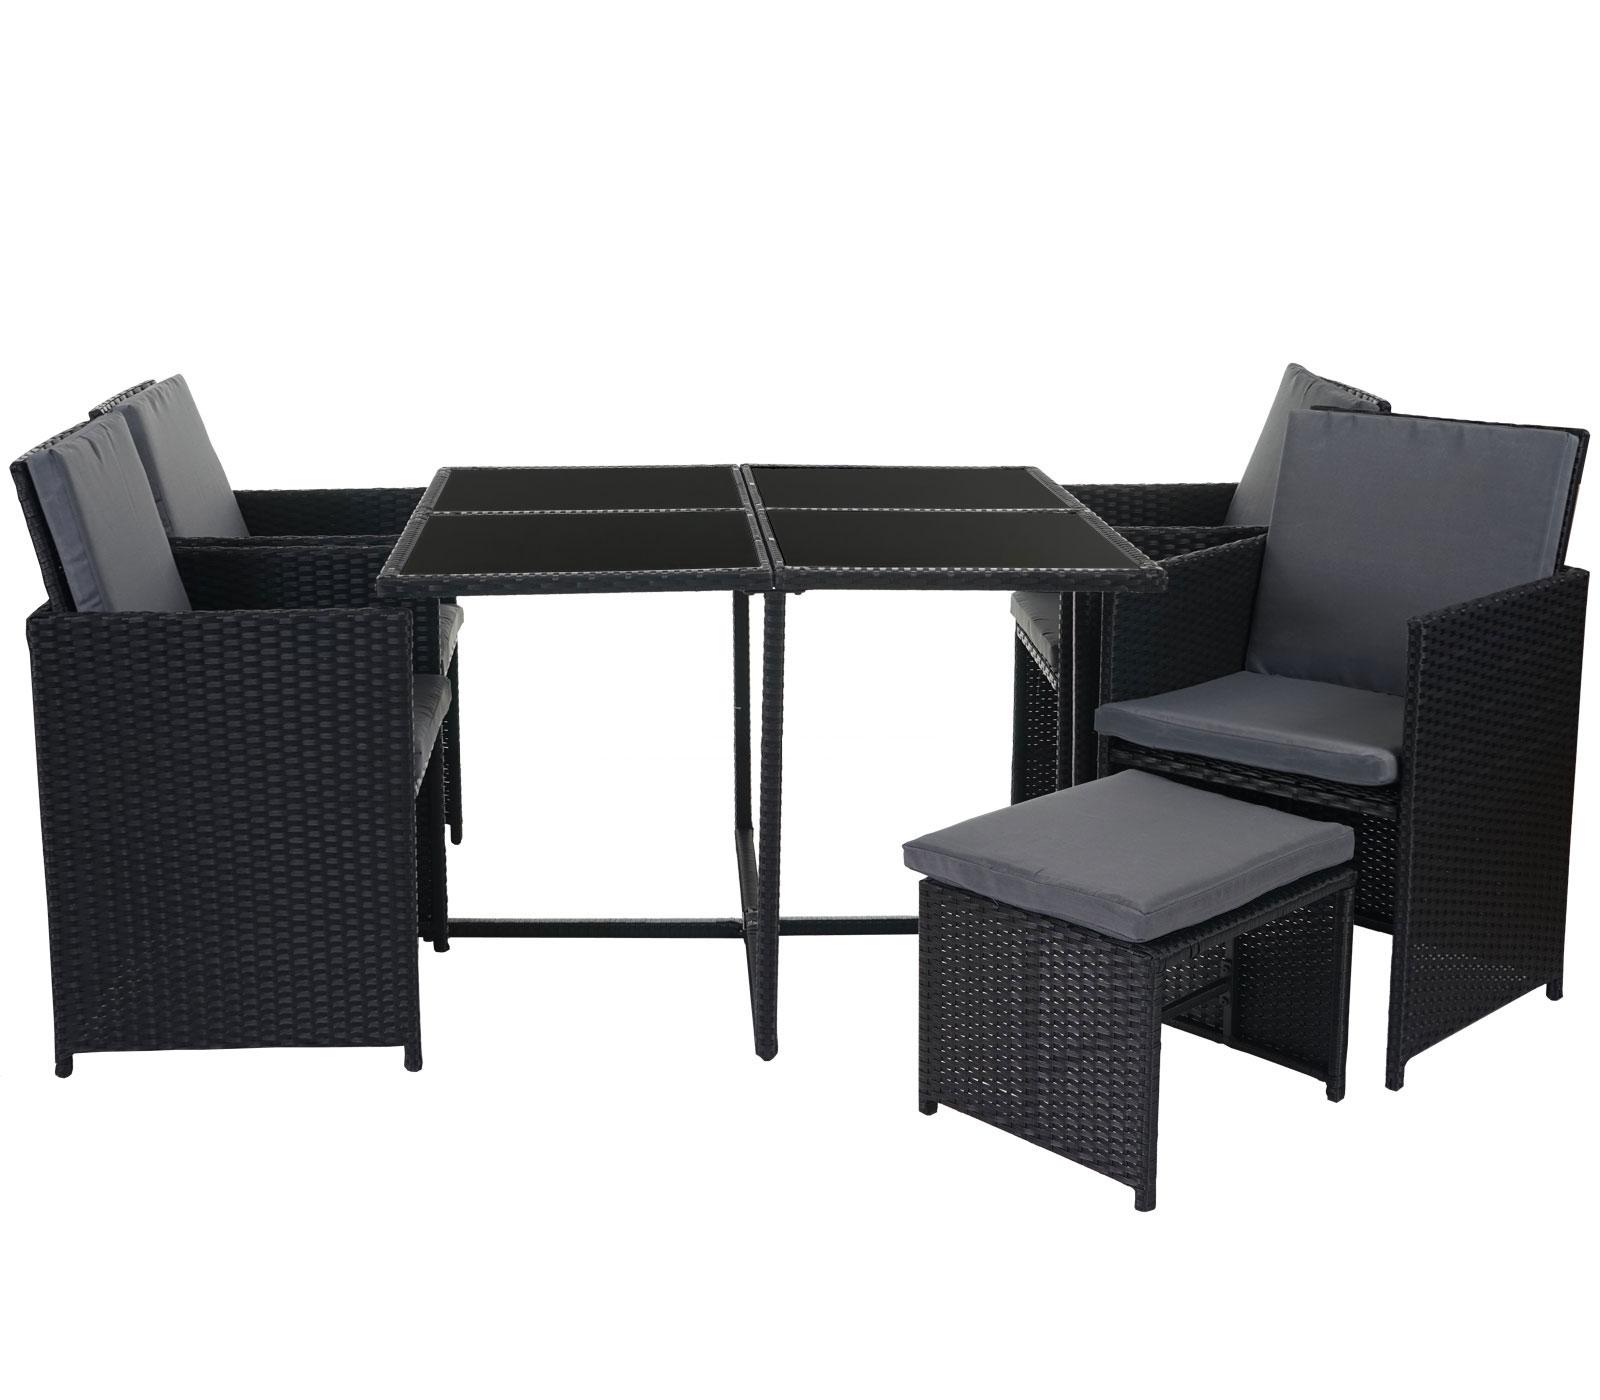 poly rattan garten garnitur lounge set sitzgruppe 4 st hle schwarz kissen grau garten. Black Bedroom Furniture Sets. Home Design Ideas